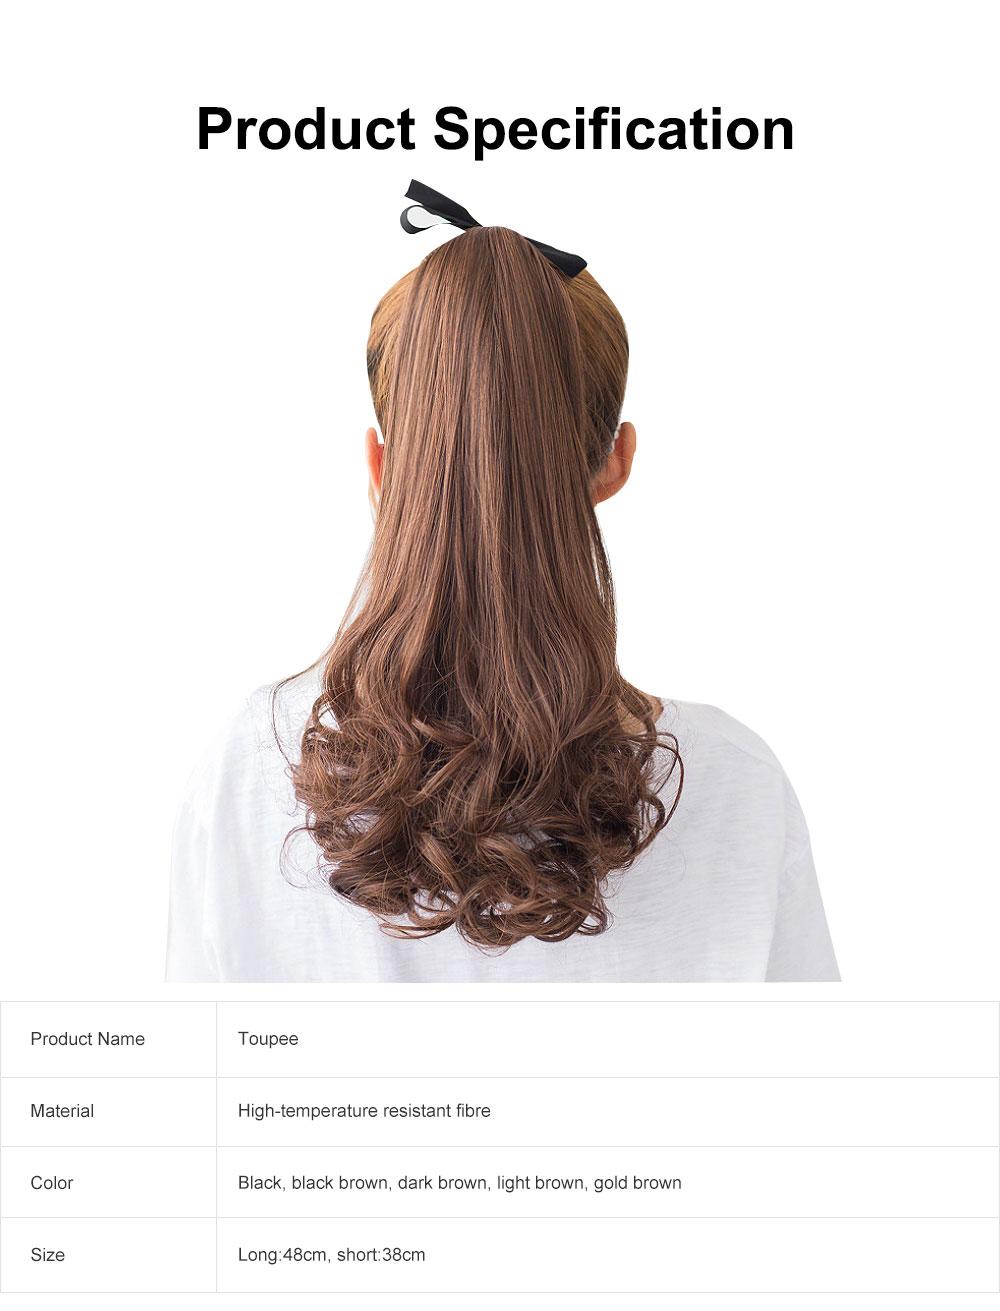 Bandage Type Korean Style Toupee Rinka, Ponytail Curved Hair for Lady, Elegant High Temperature Resistant Stylish Wig 6